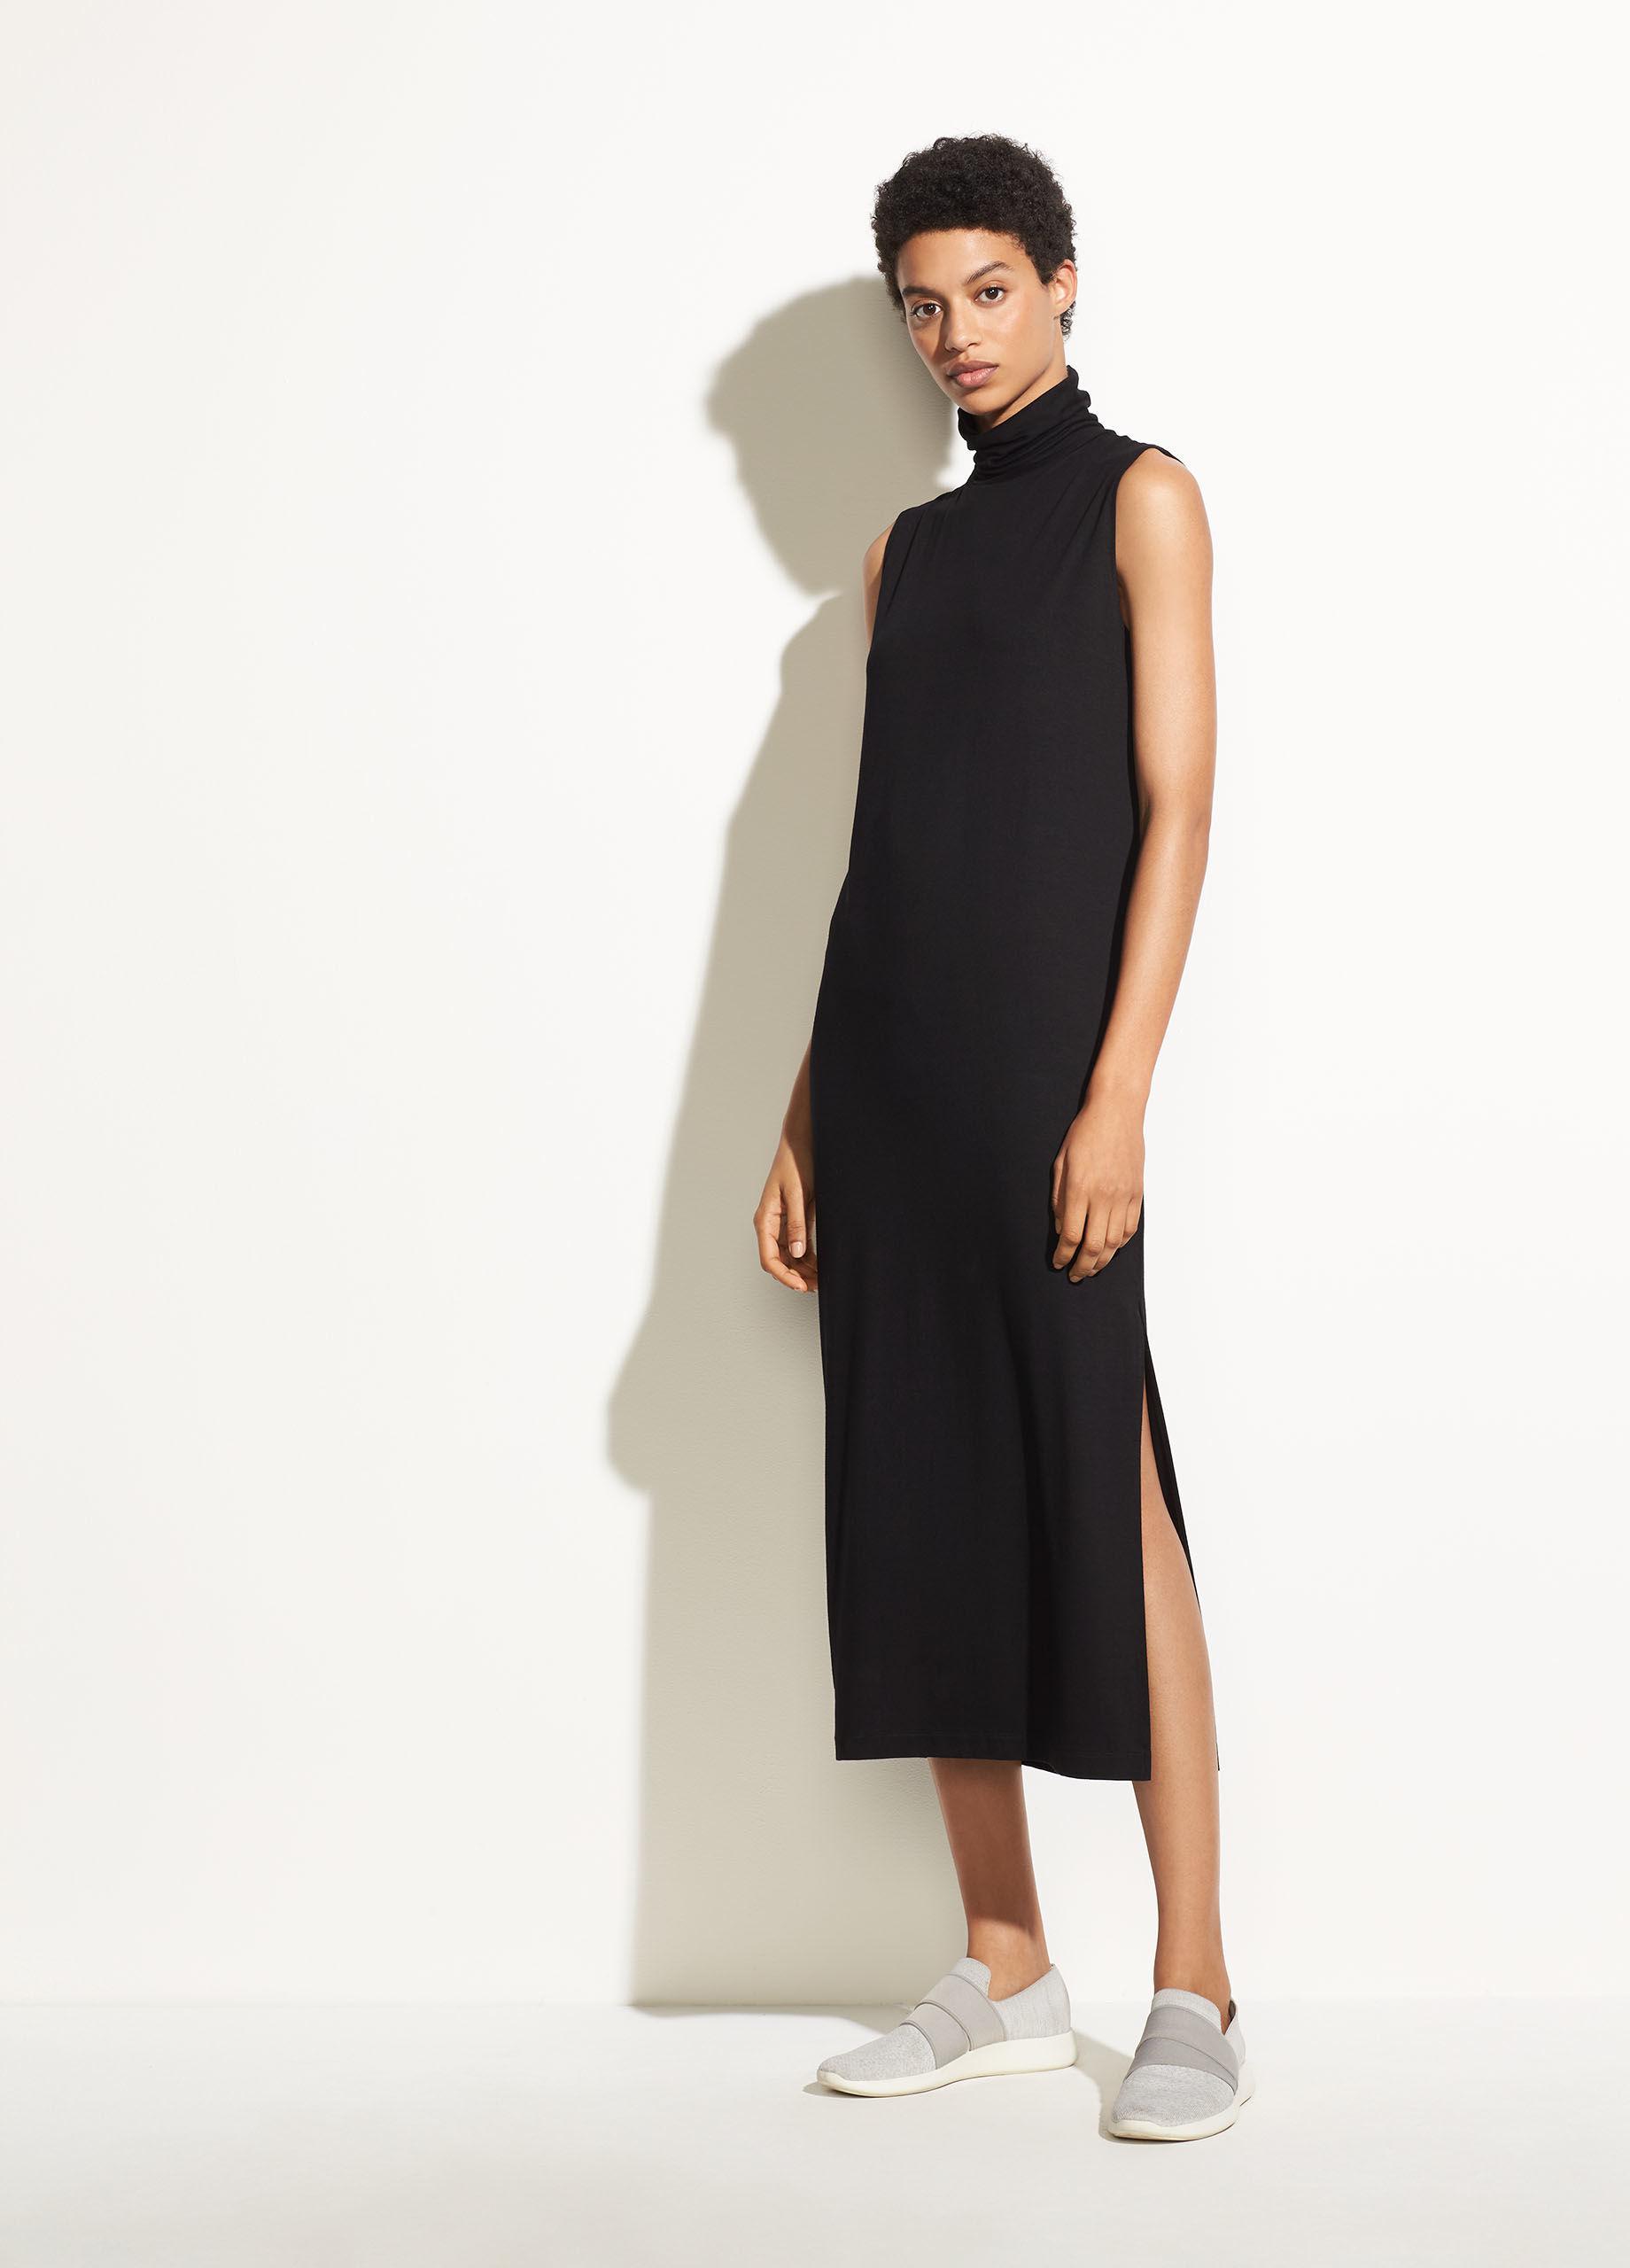 e9f1a40003b2fa Vince Sleeveless Turtleneck Dress (black) Women s Dress in Black - Lyst